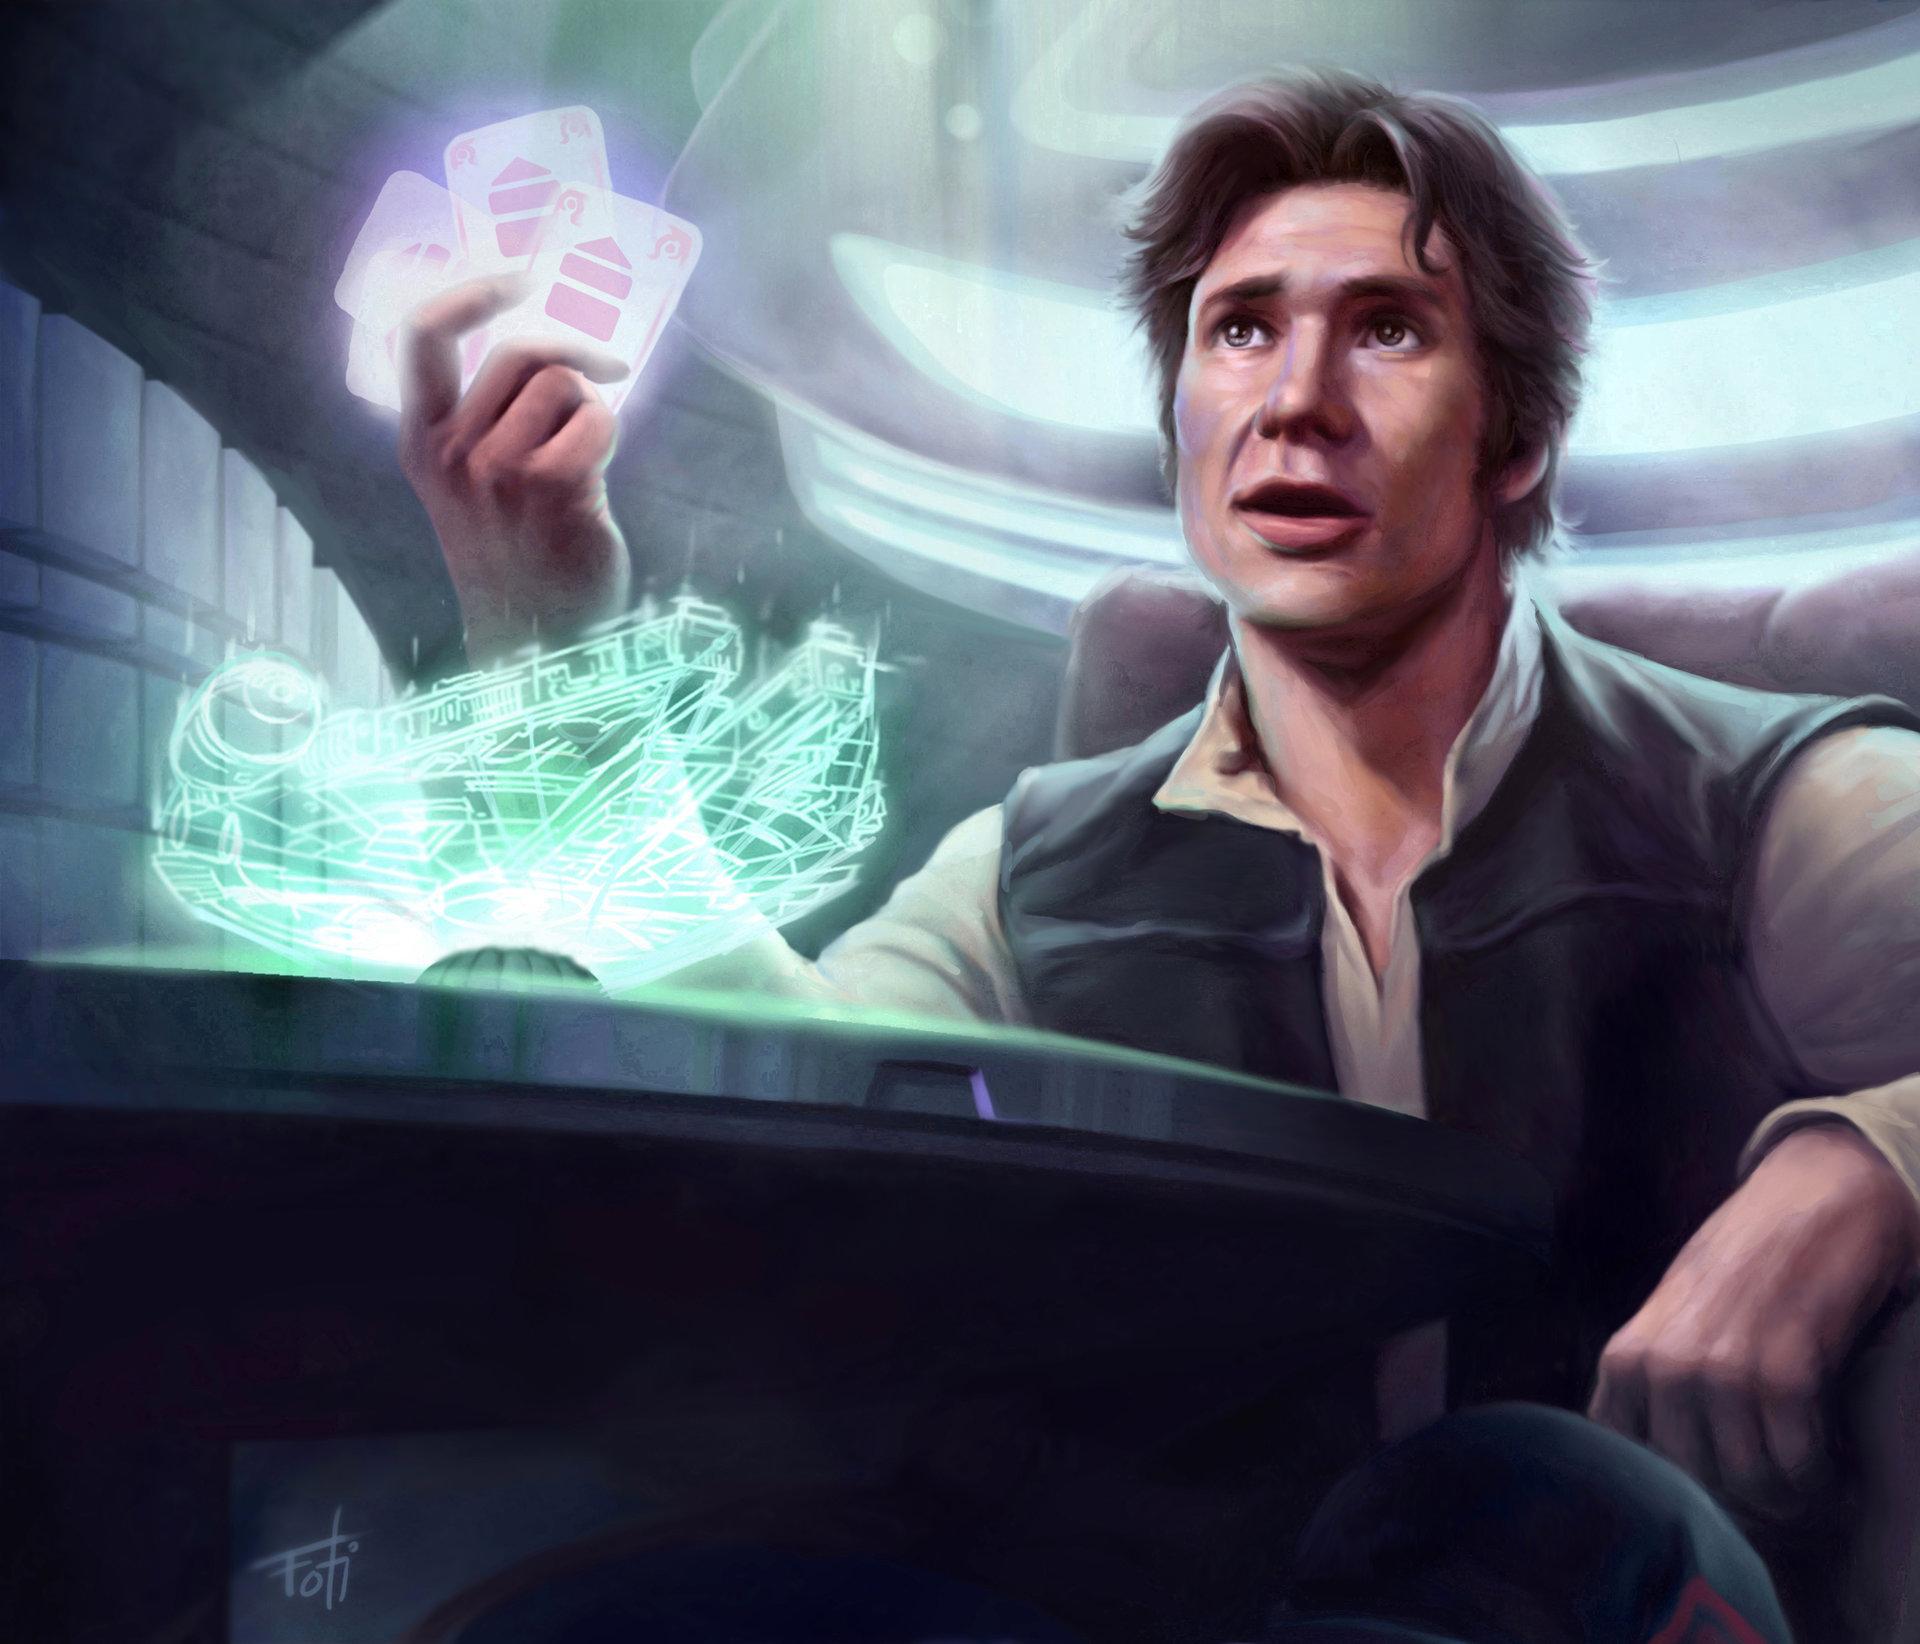 Fil:Han Solo.jpg